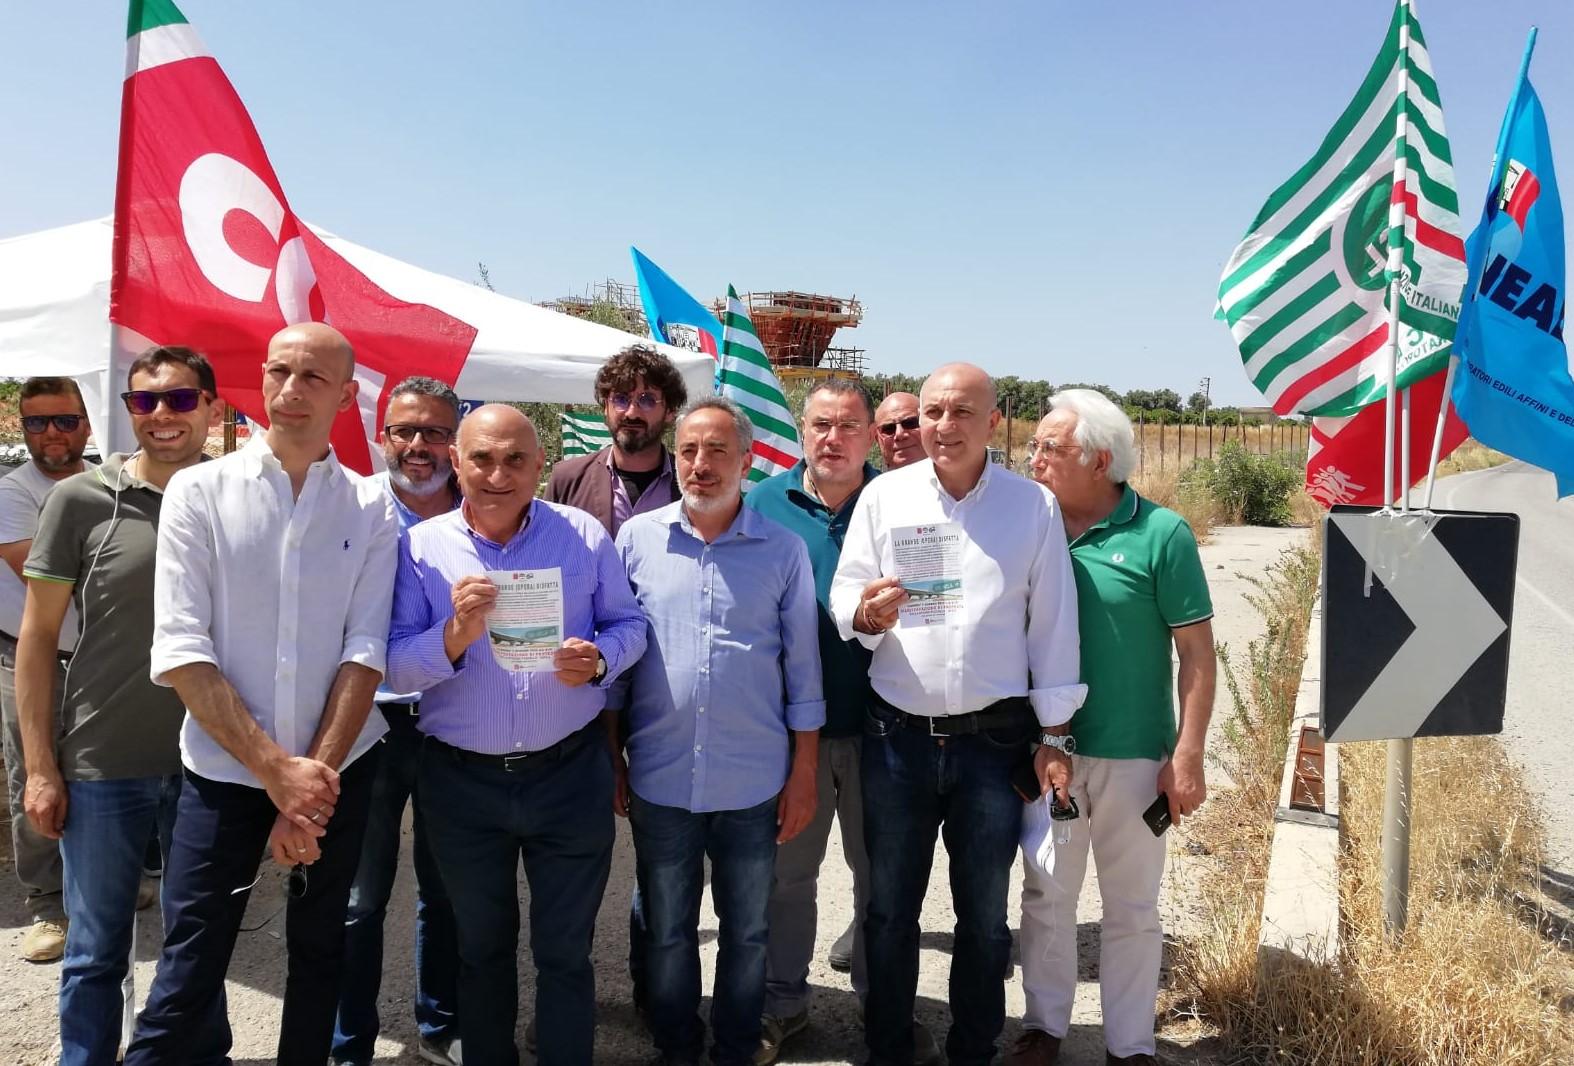 Autostrada Siracusa-Gela: i sindacati annunciano sit in di protesta